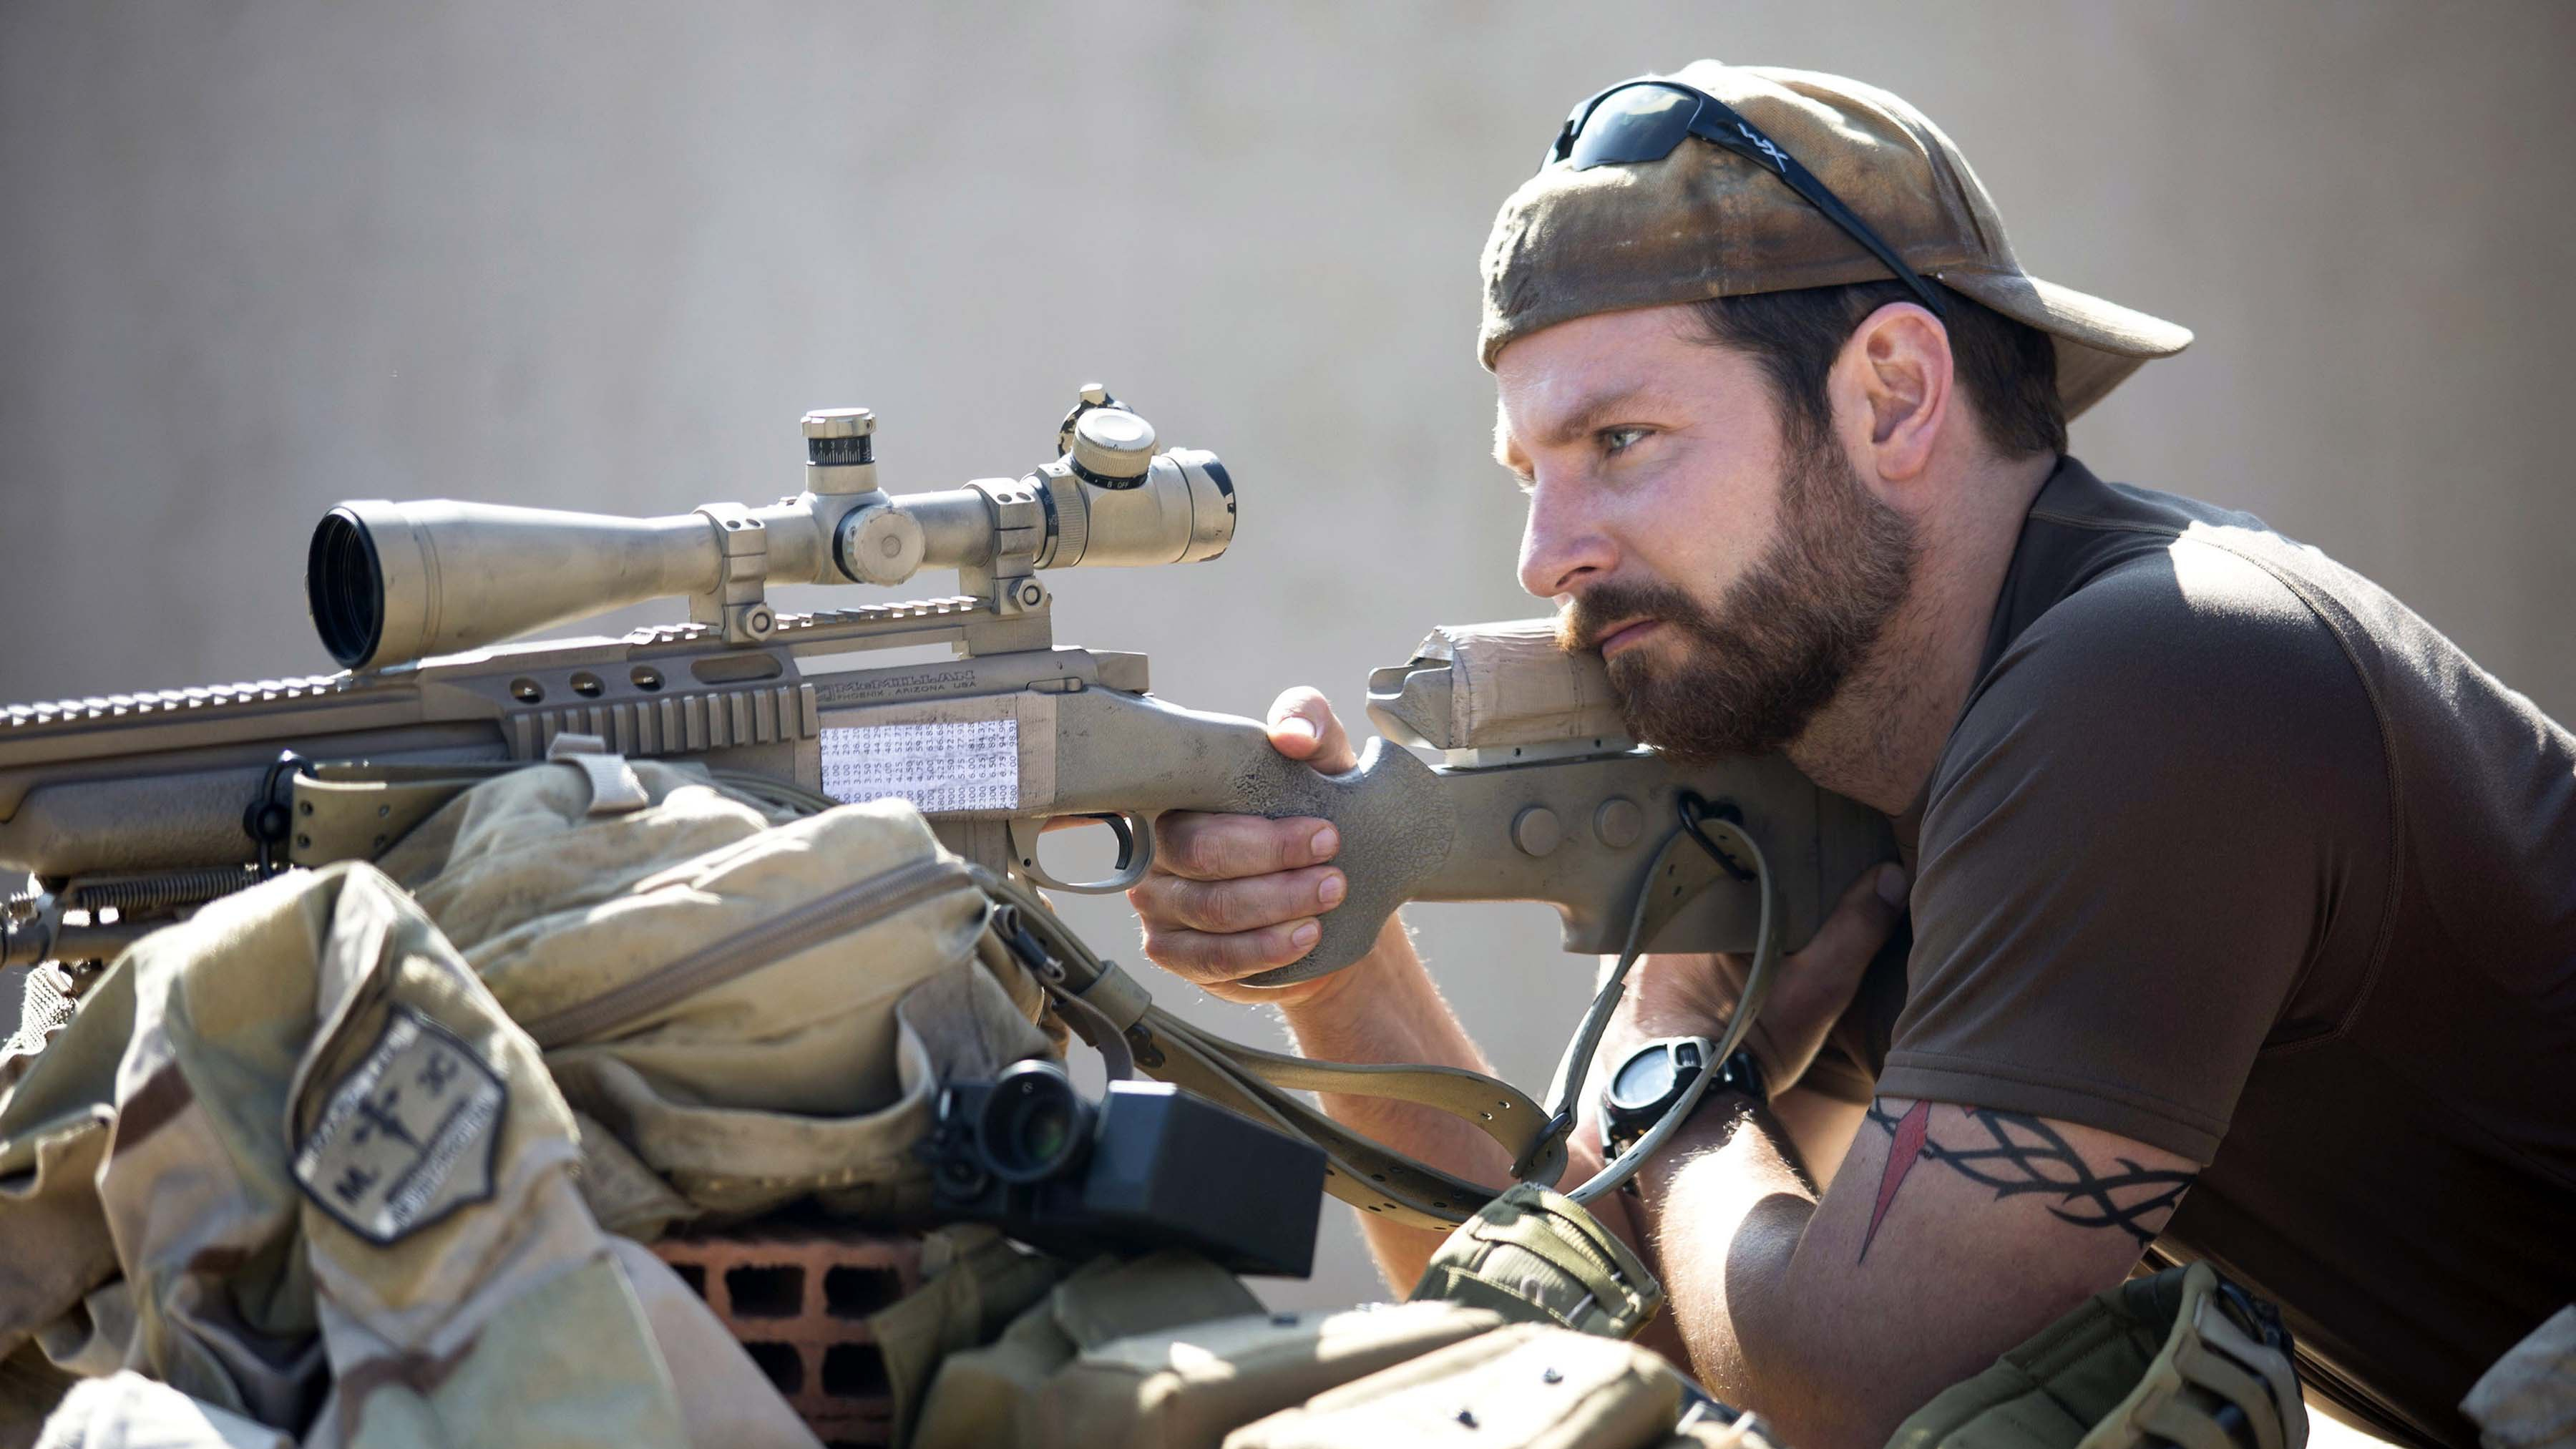 164003984-american-sniper-wallpapers.jpg